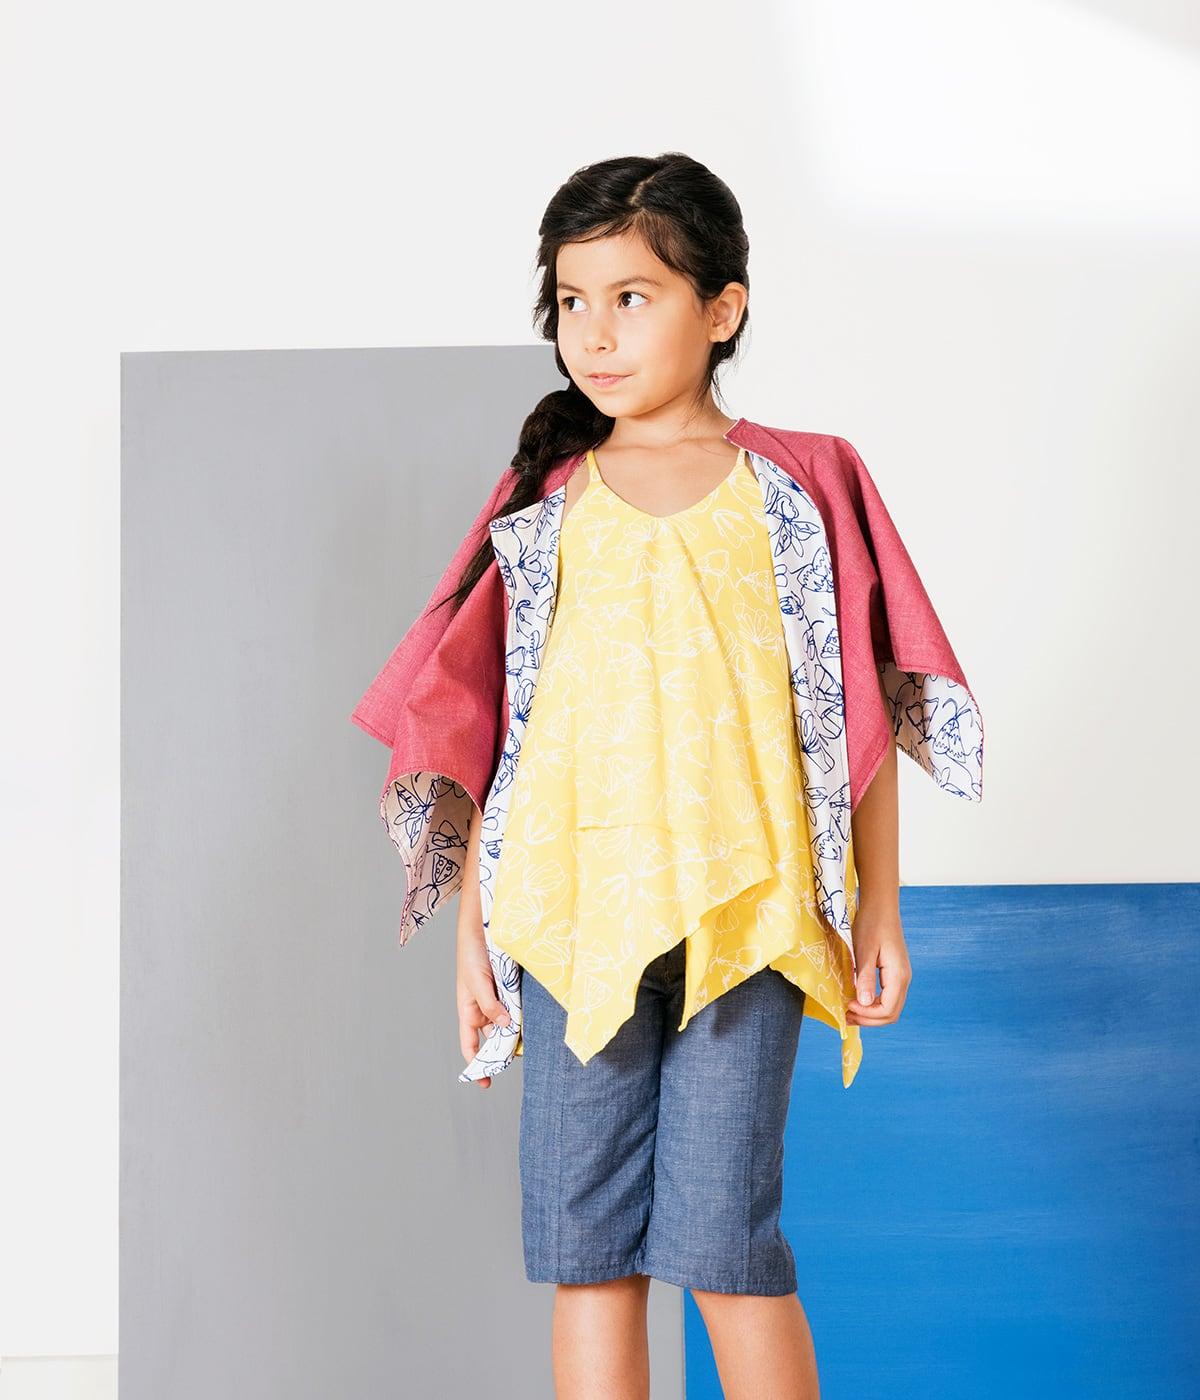 Luxe Digital luxury sustainable fashion Jake+ Maya